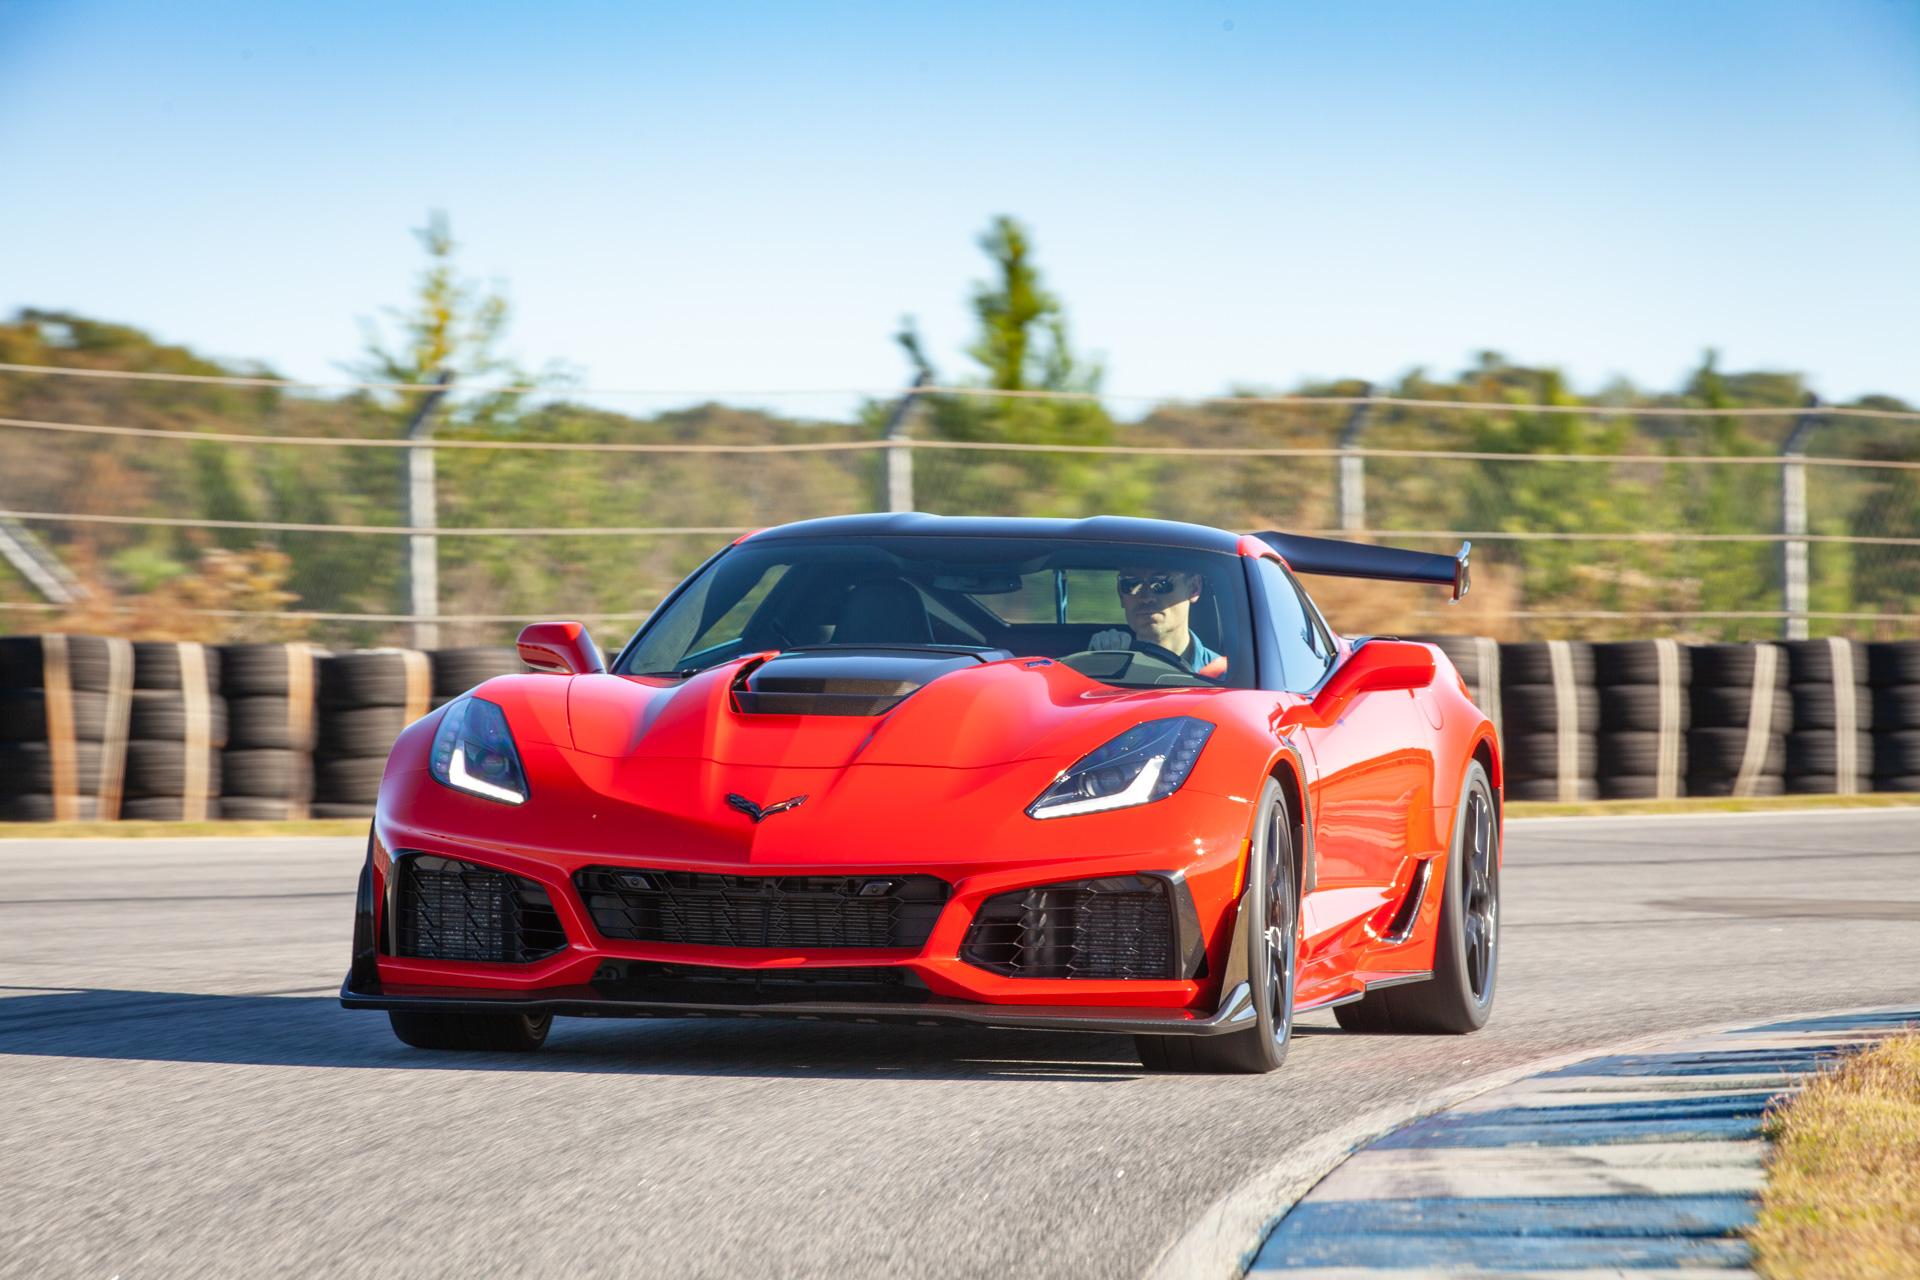 Chevrolet Corvette ZR1: Motor Authority's Best Car To Buy 2019